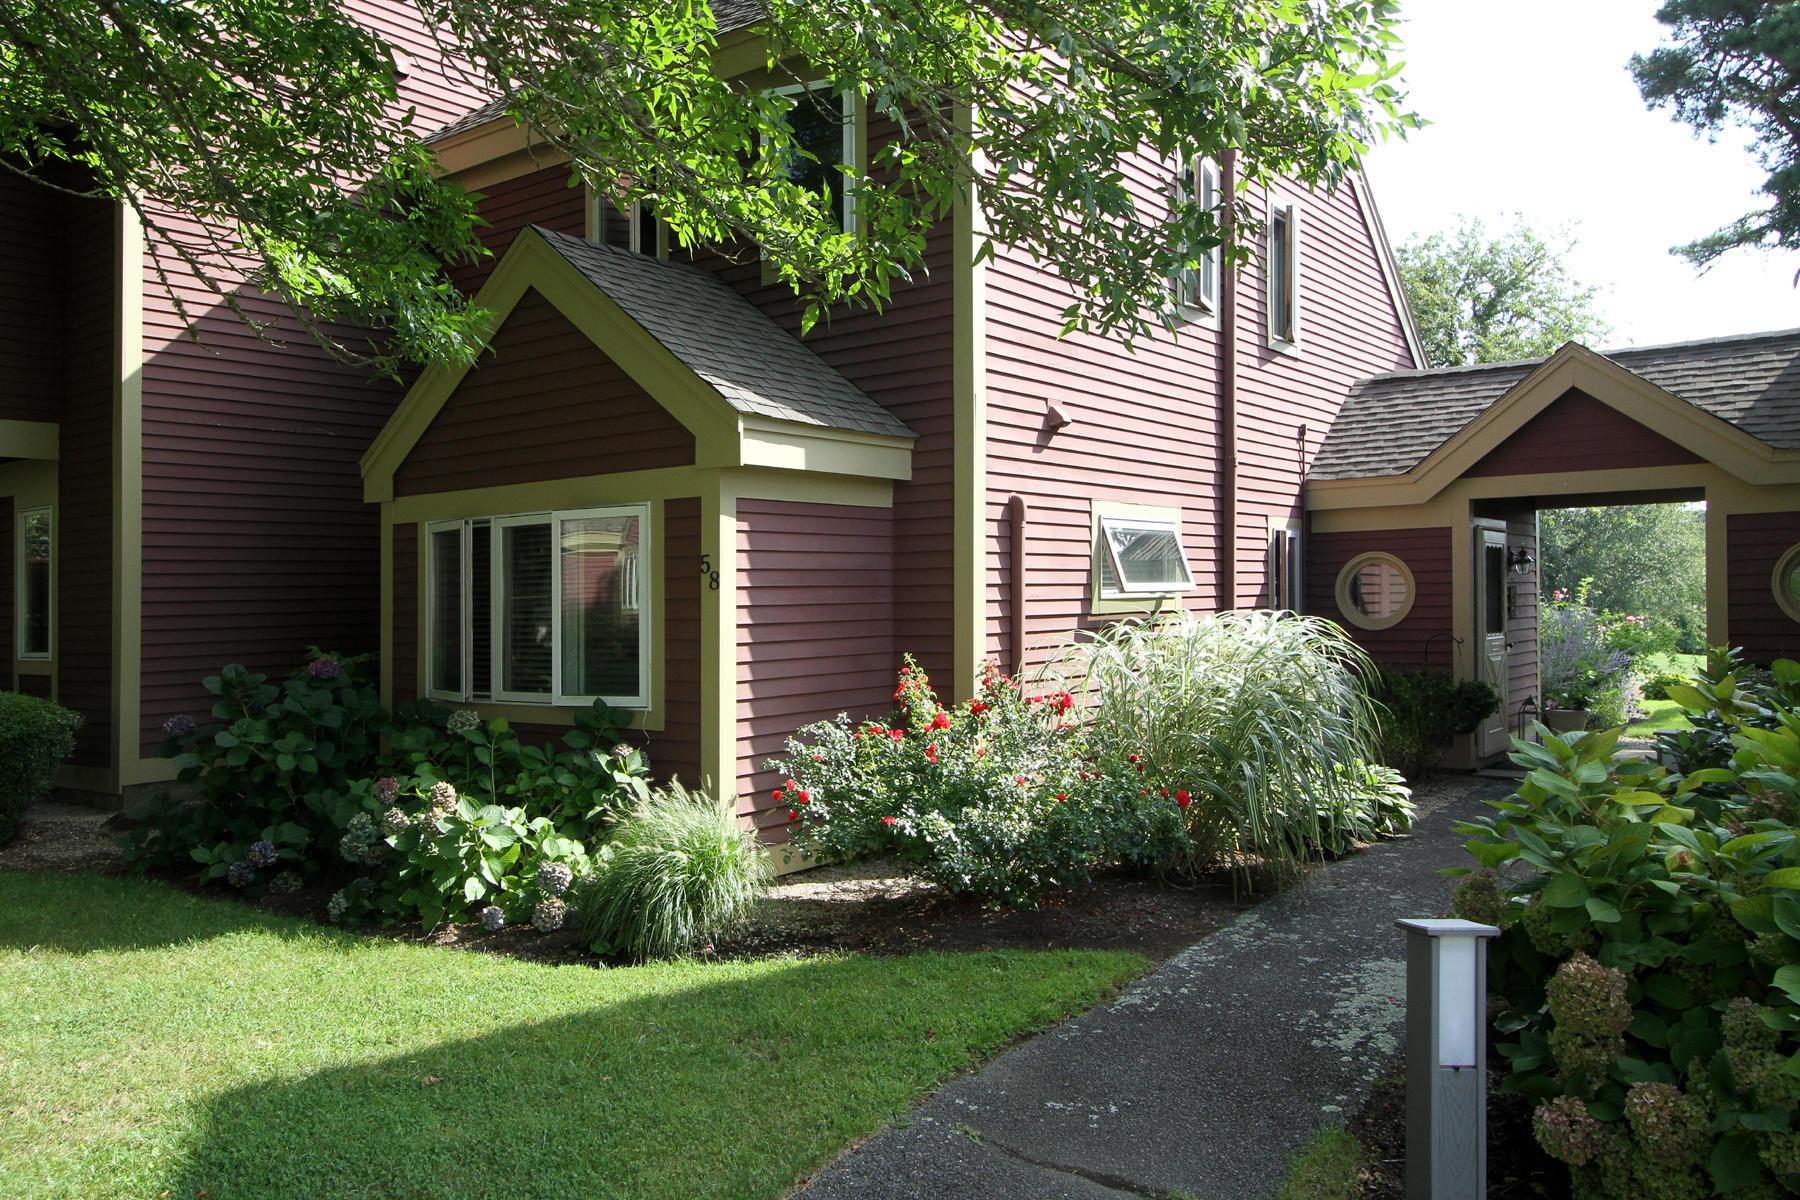 58 Billington Lane, Brewster MA, 02631